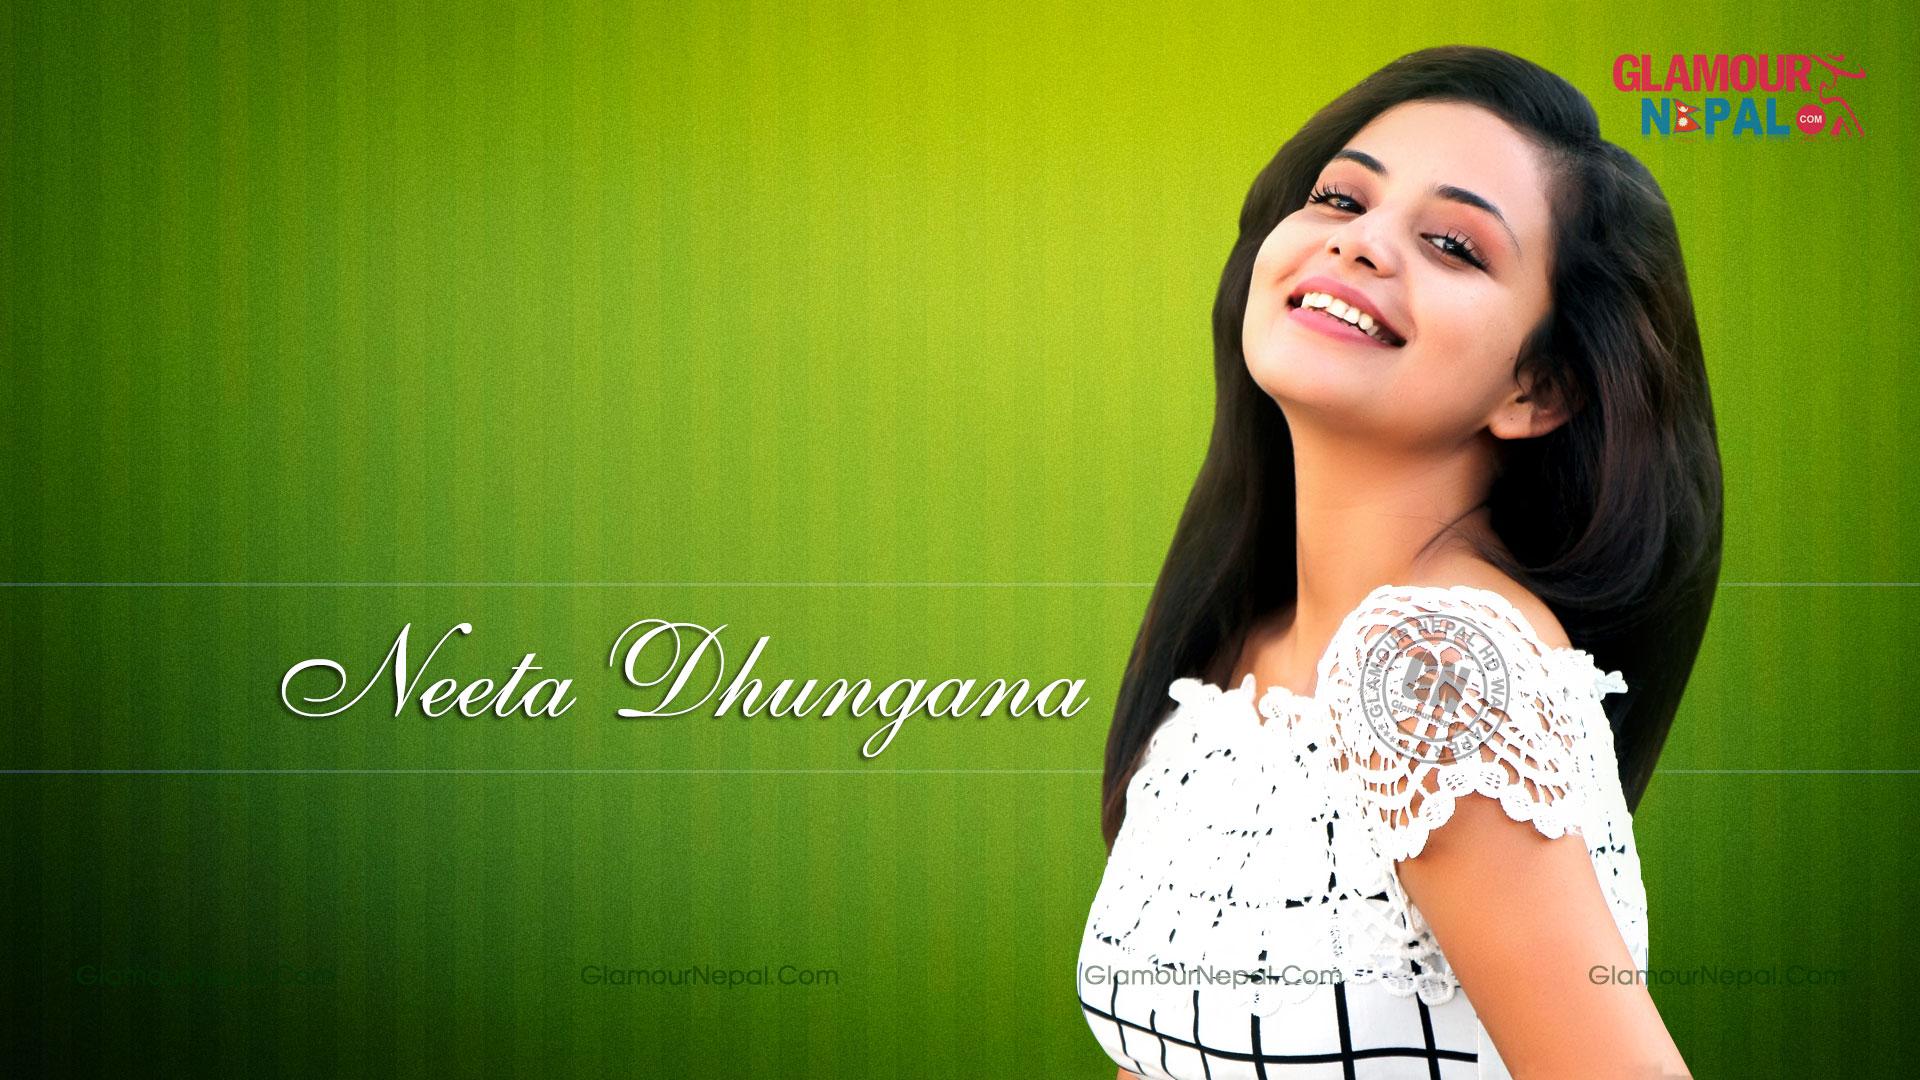 Nepali-Actress-Neeta-Dhungana-HD-Wallpaper-1920x1080